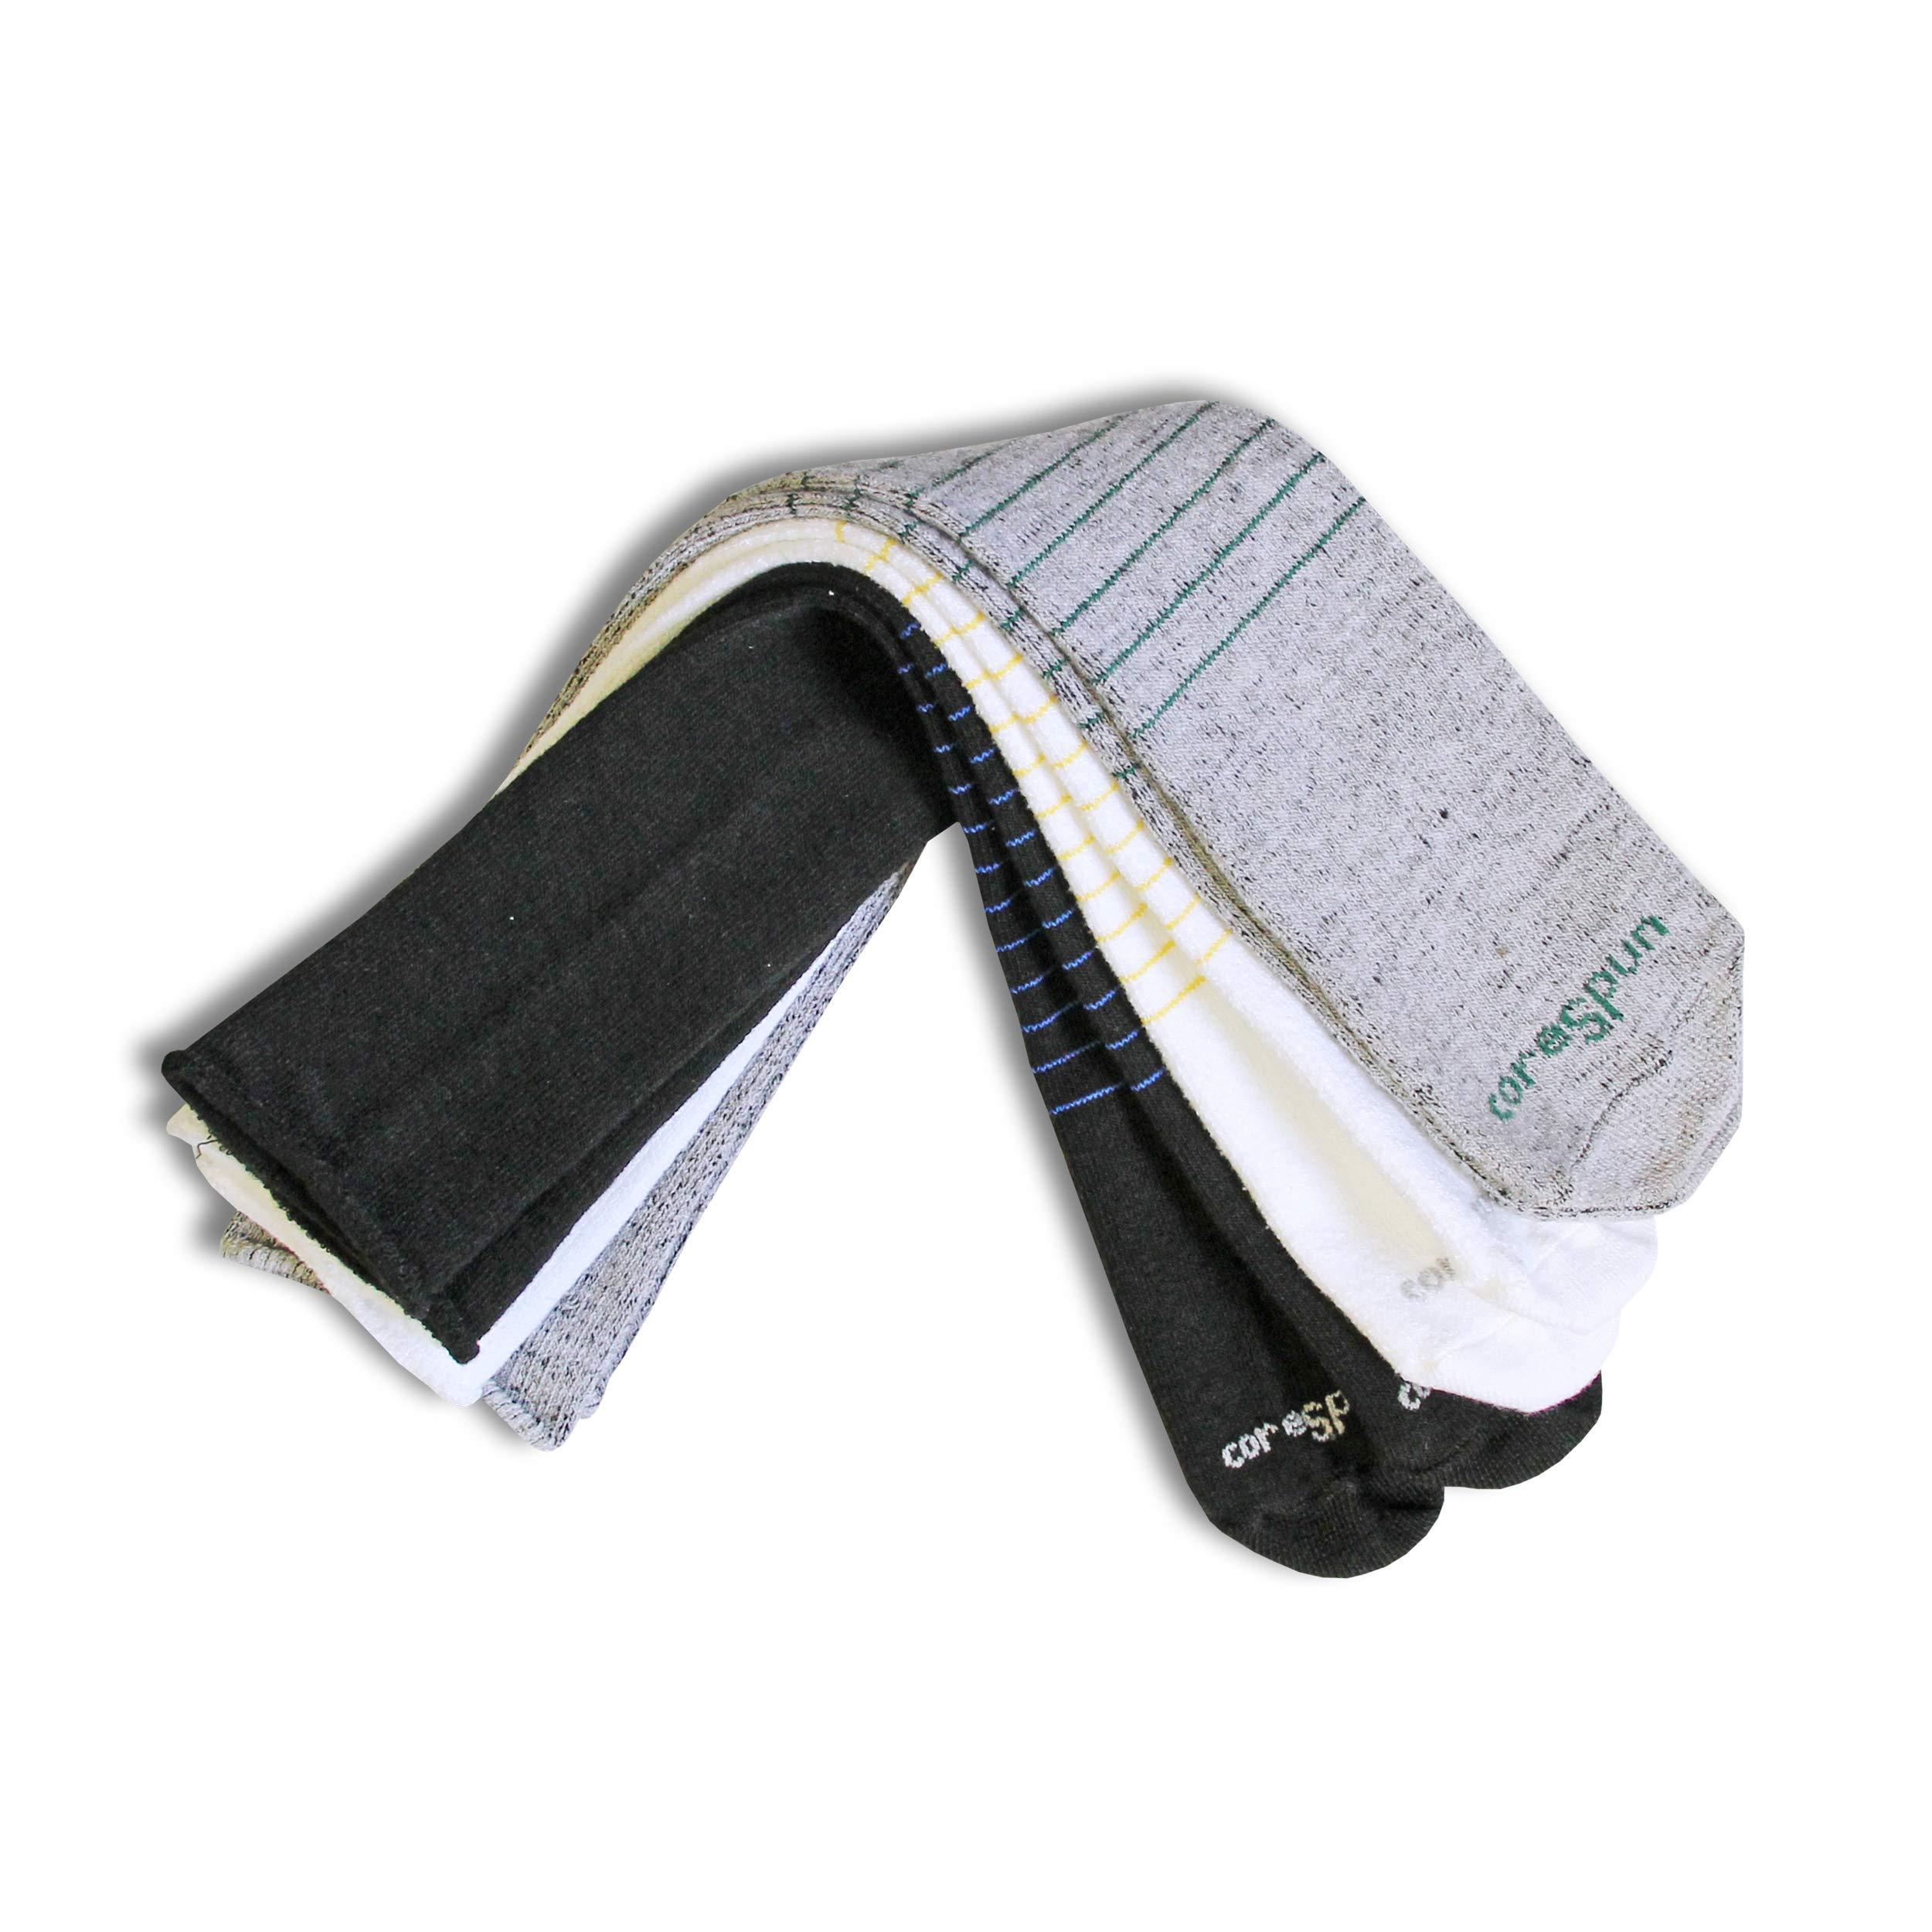 Core-Spun Patterned Seamless AFO Interface Socks for Kids (3-Pack) - Black White & Grey Stripes, Regular